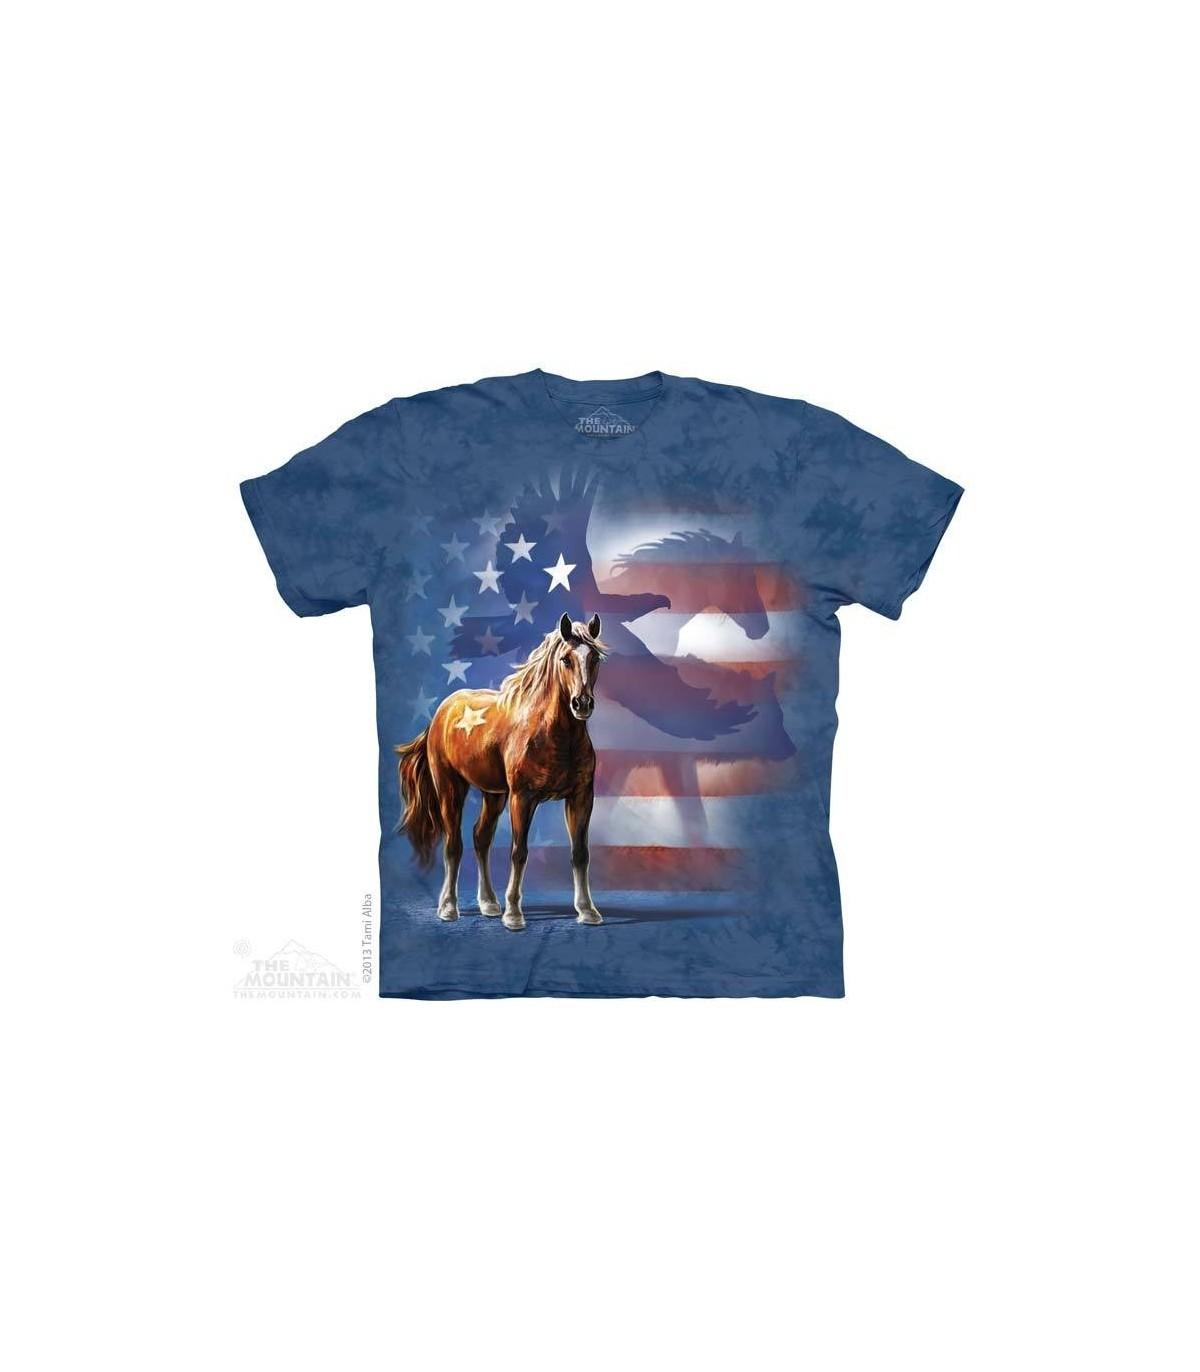 845b16d62a Wild Star Flag - Patriotic Horse T Shirt The Mountain